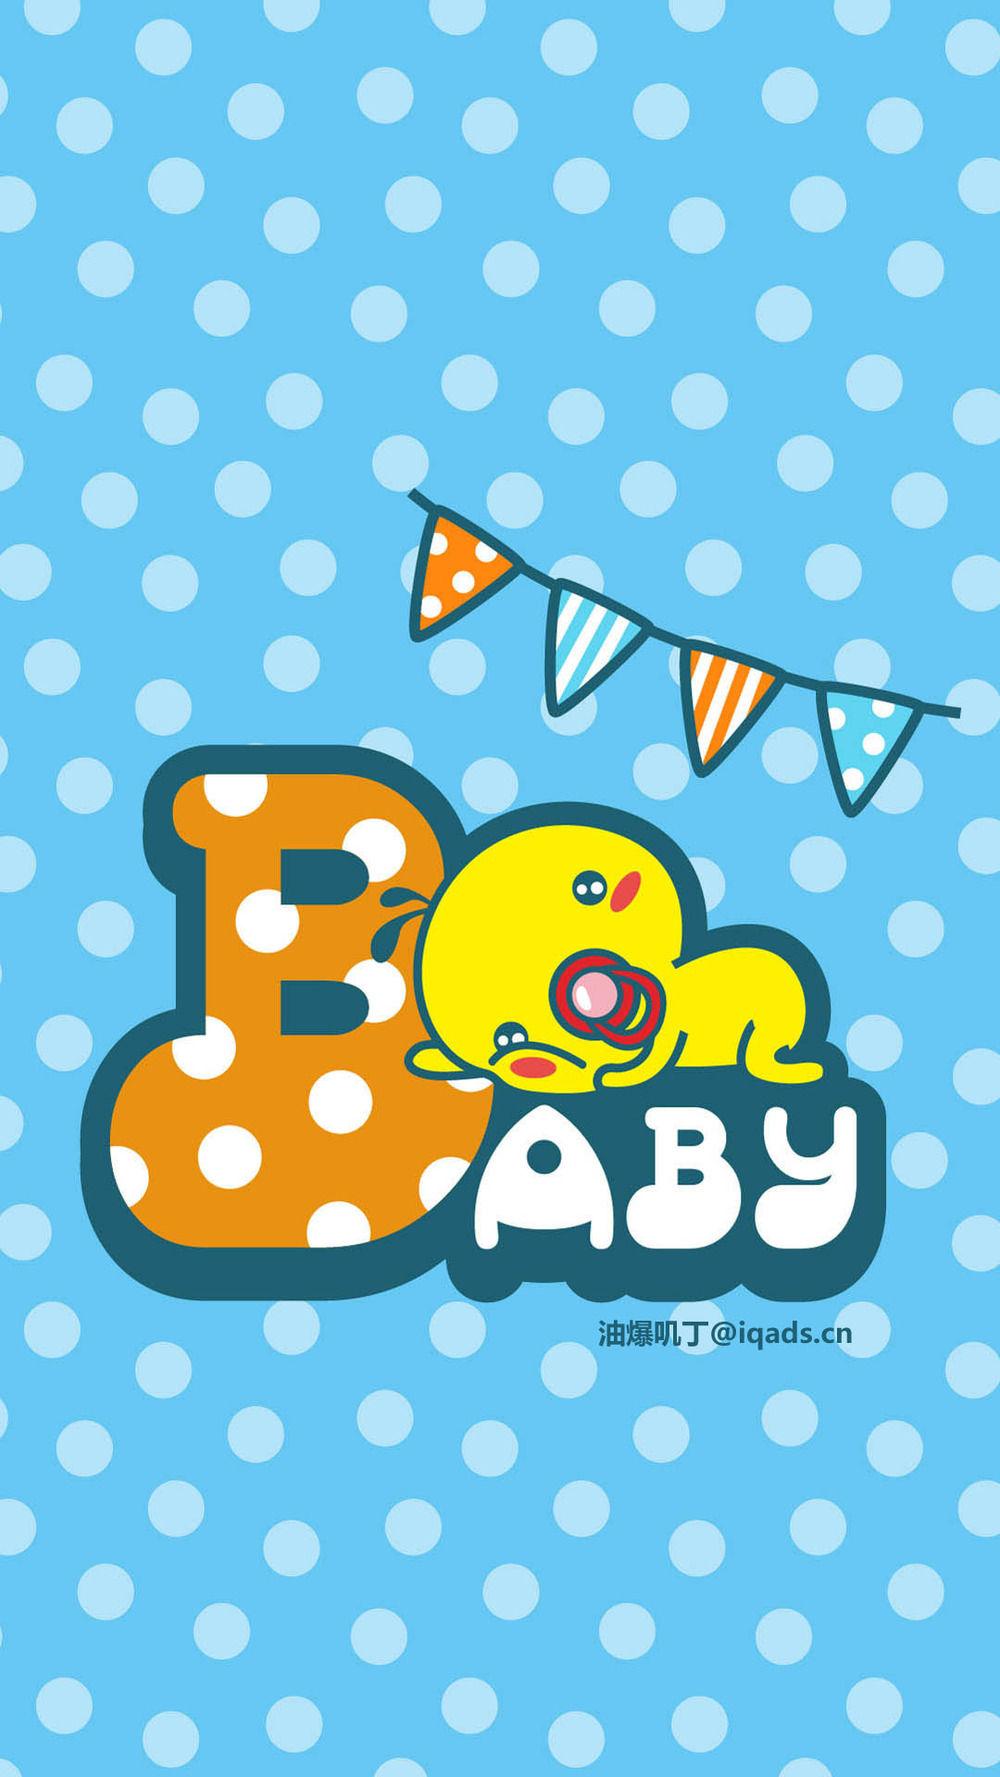 baby-1080x1920.jpg